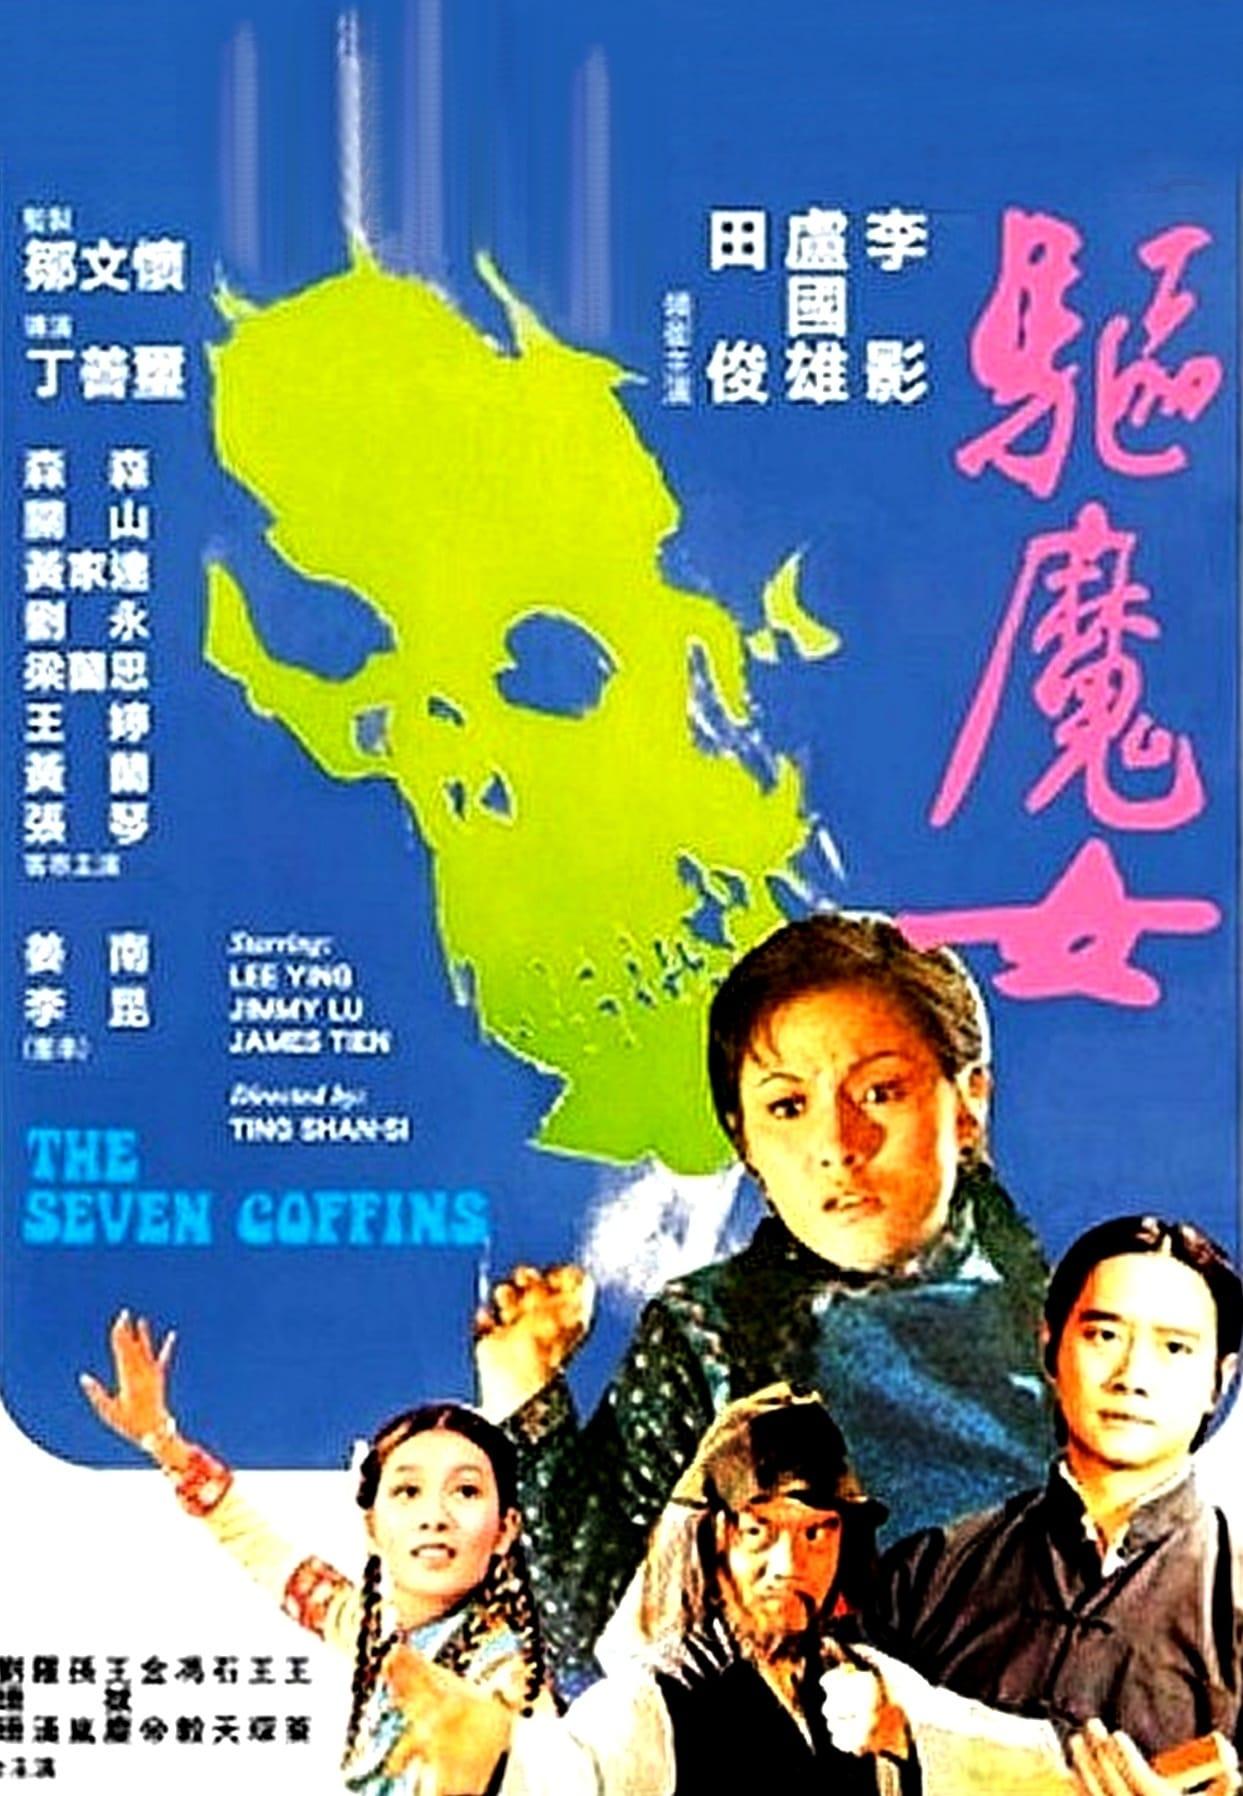 The Seven Coffins